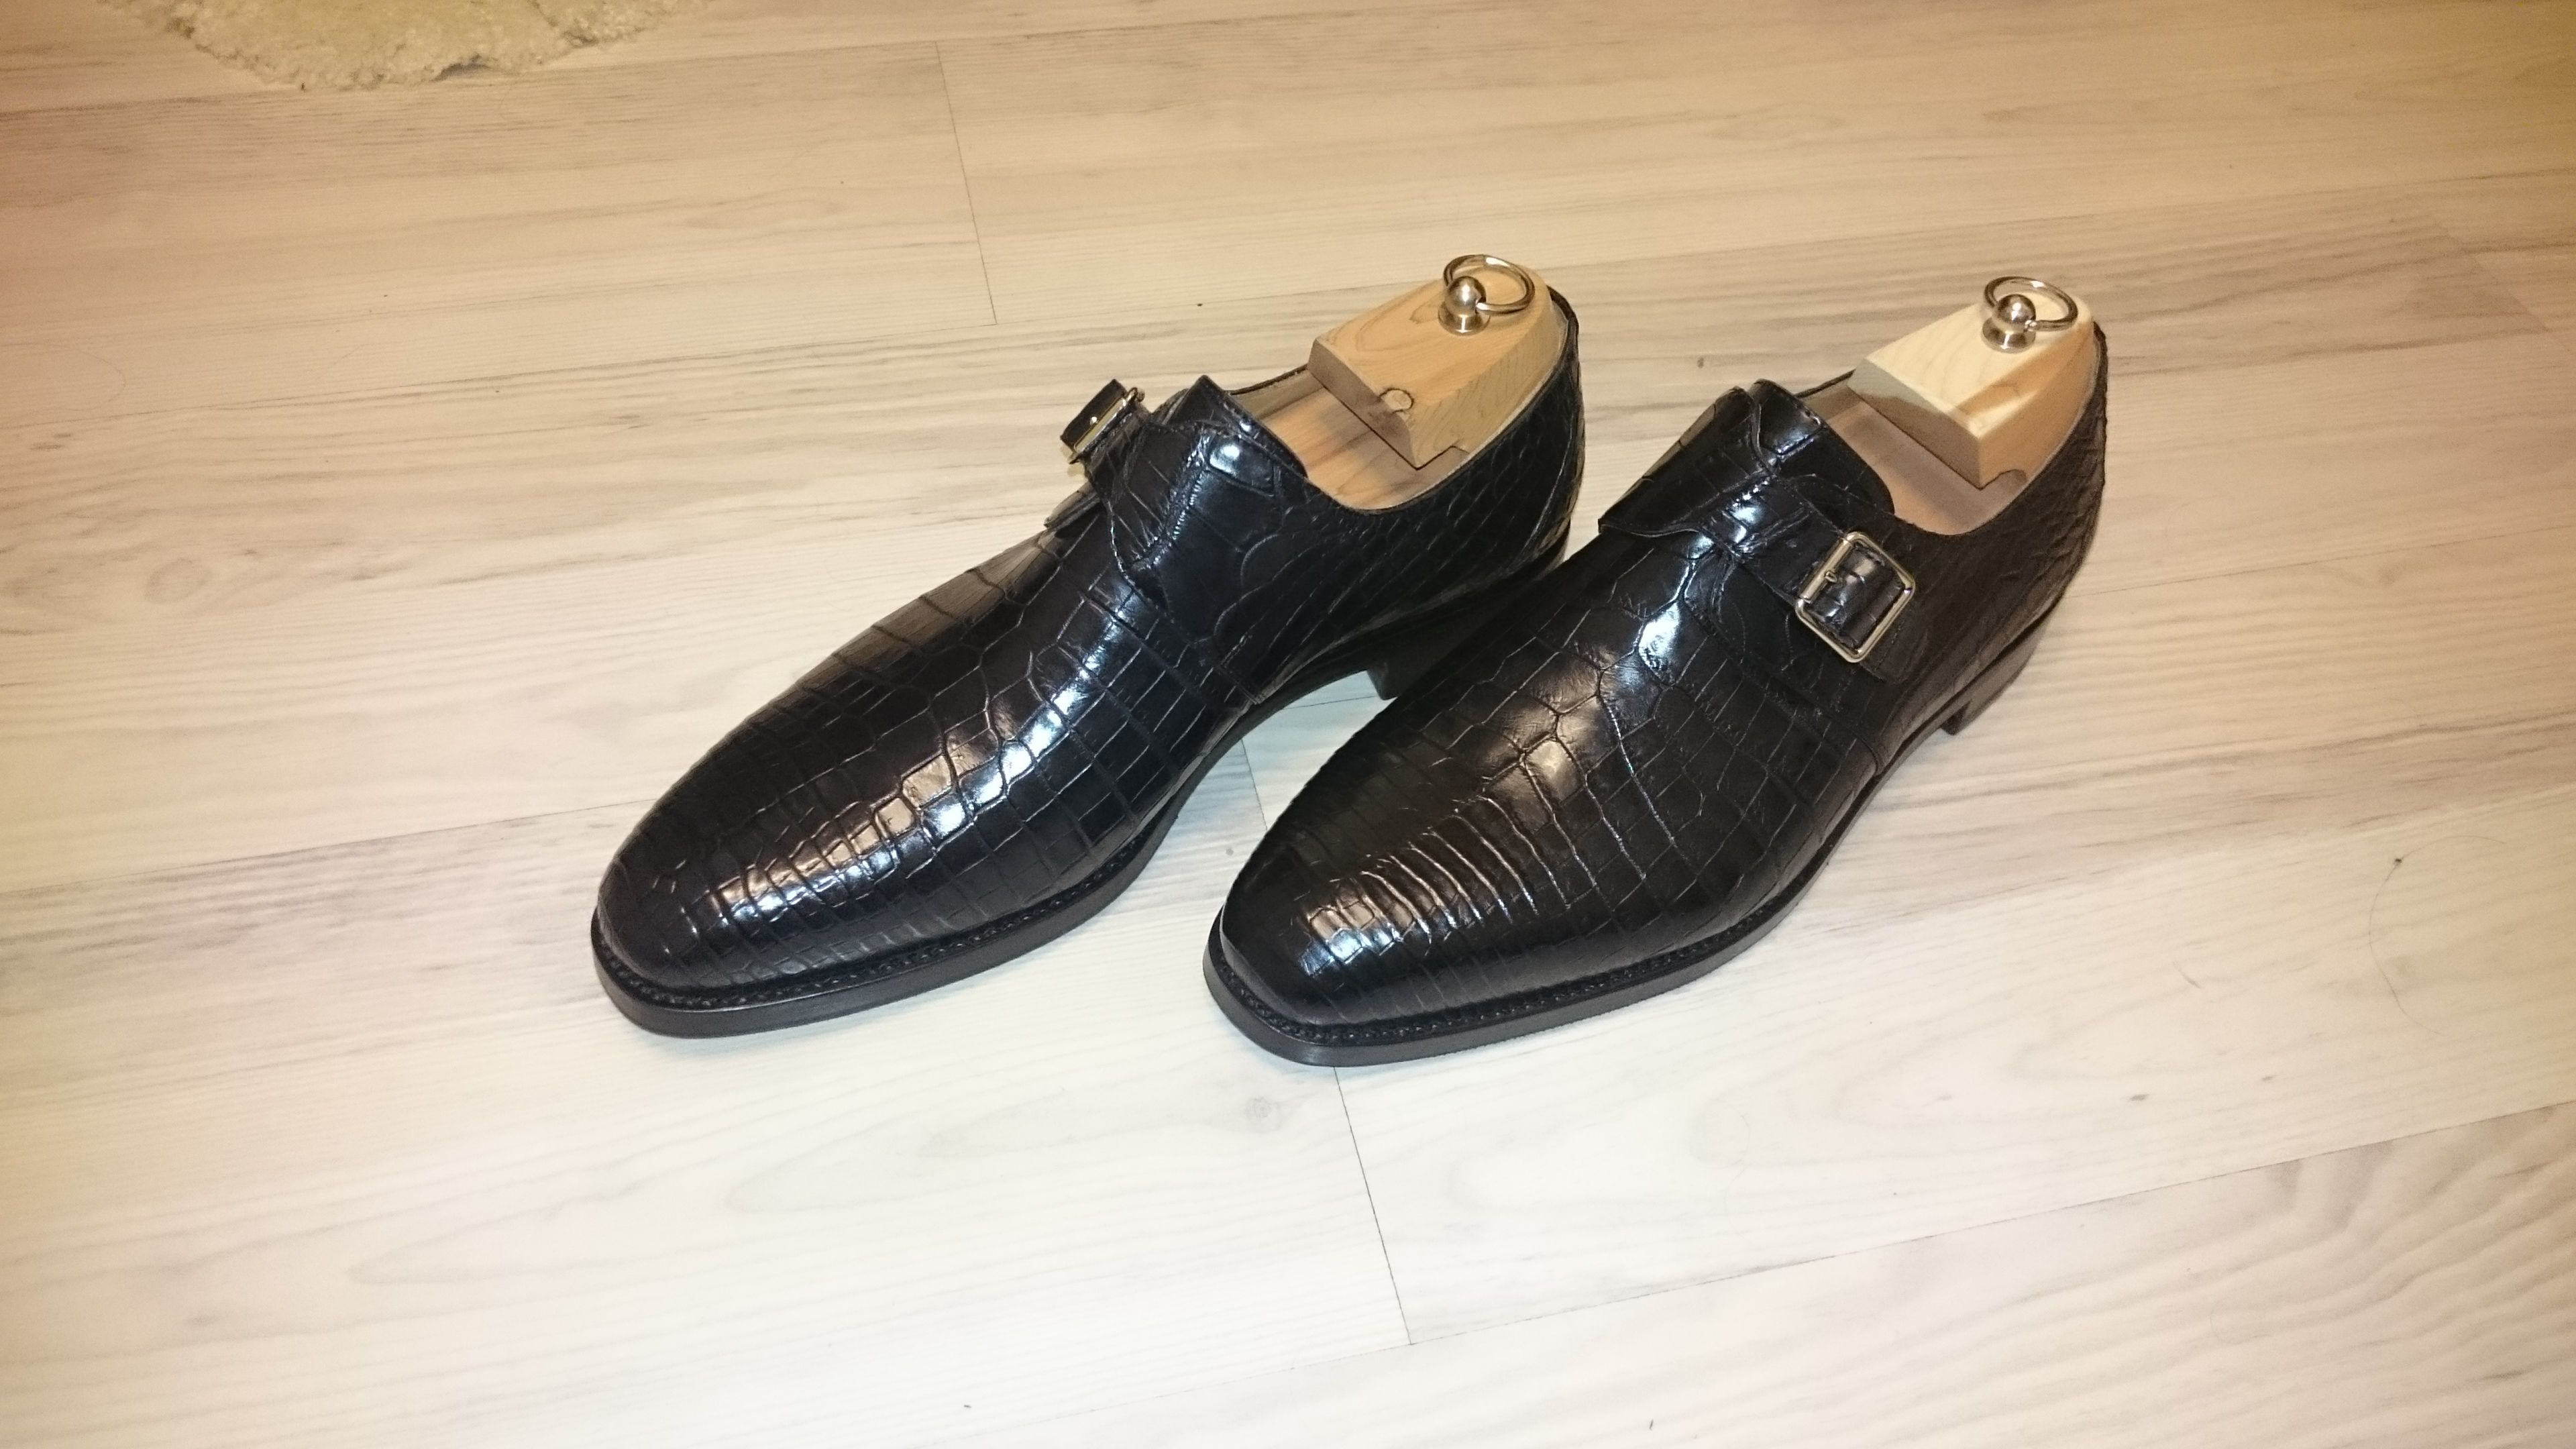 grunberg's photos in Alligator / Crocodile Shoes